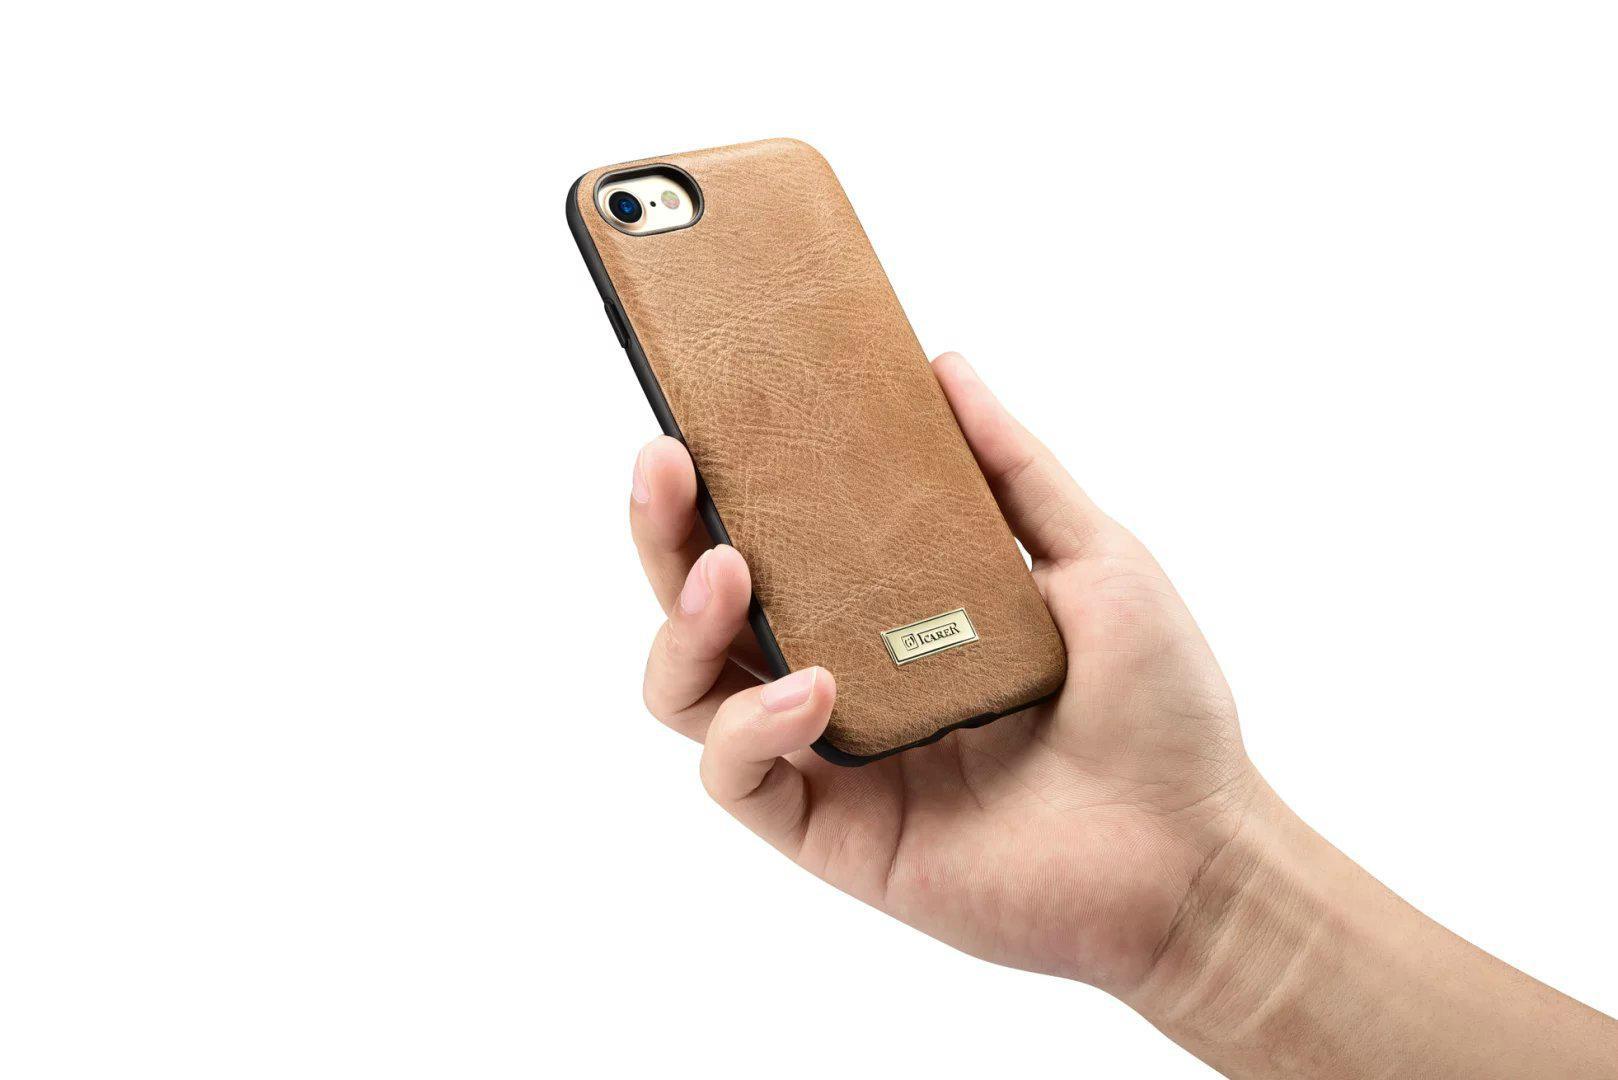 iCarer iPhone 7 Shenzhou Genuine Leather Fashional Back Cover Case 14